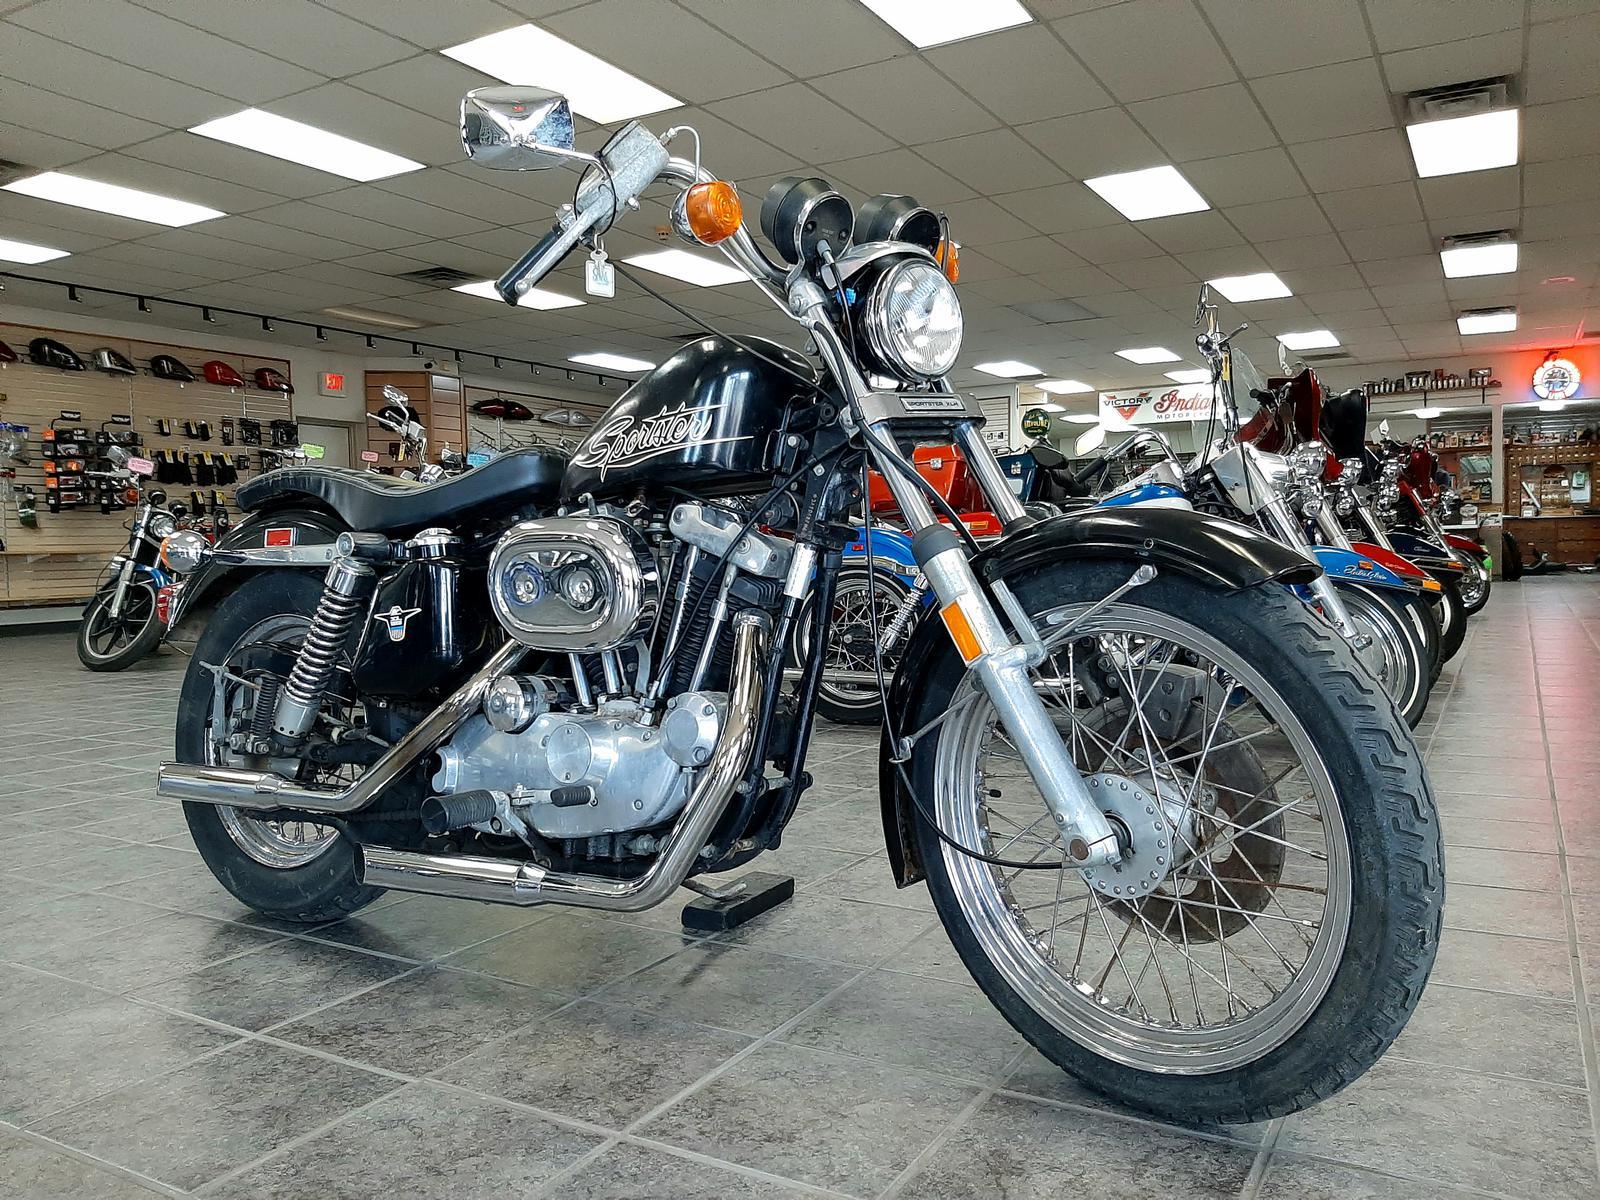 1974 Harley Davidson Ironhead Sportster For Sale In Fort Wayne In Osborn Usa Fort Wayne In 260 422 5942